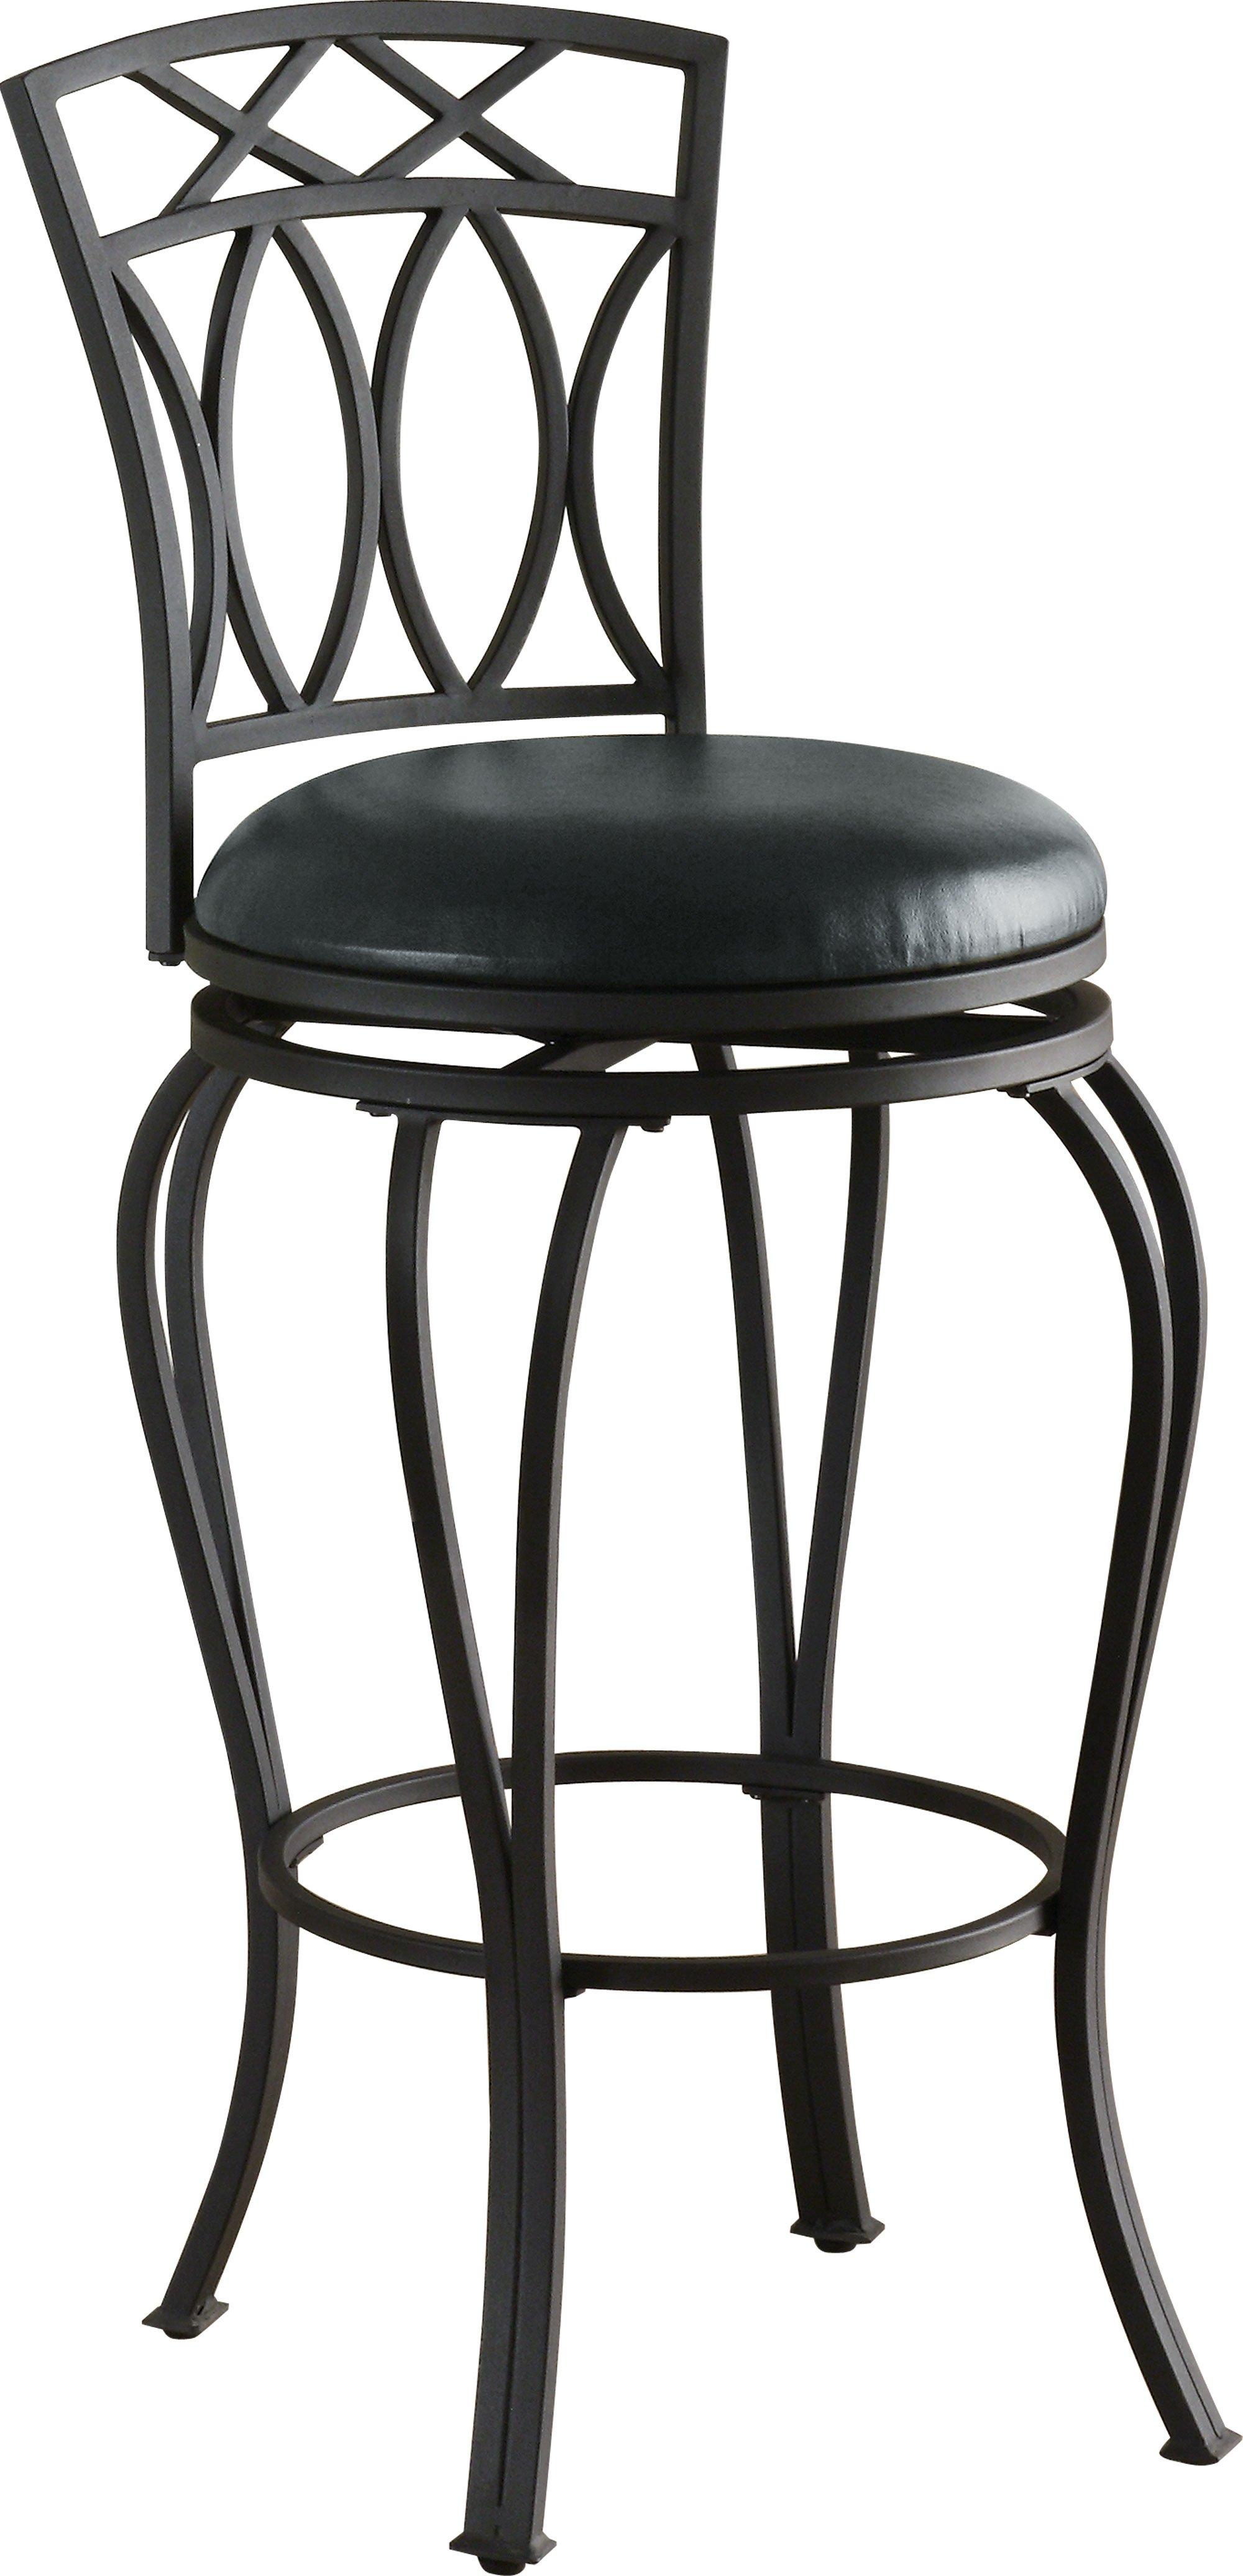 Coaster Furniture Black Metal Swivel Bar Stool The